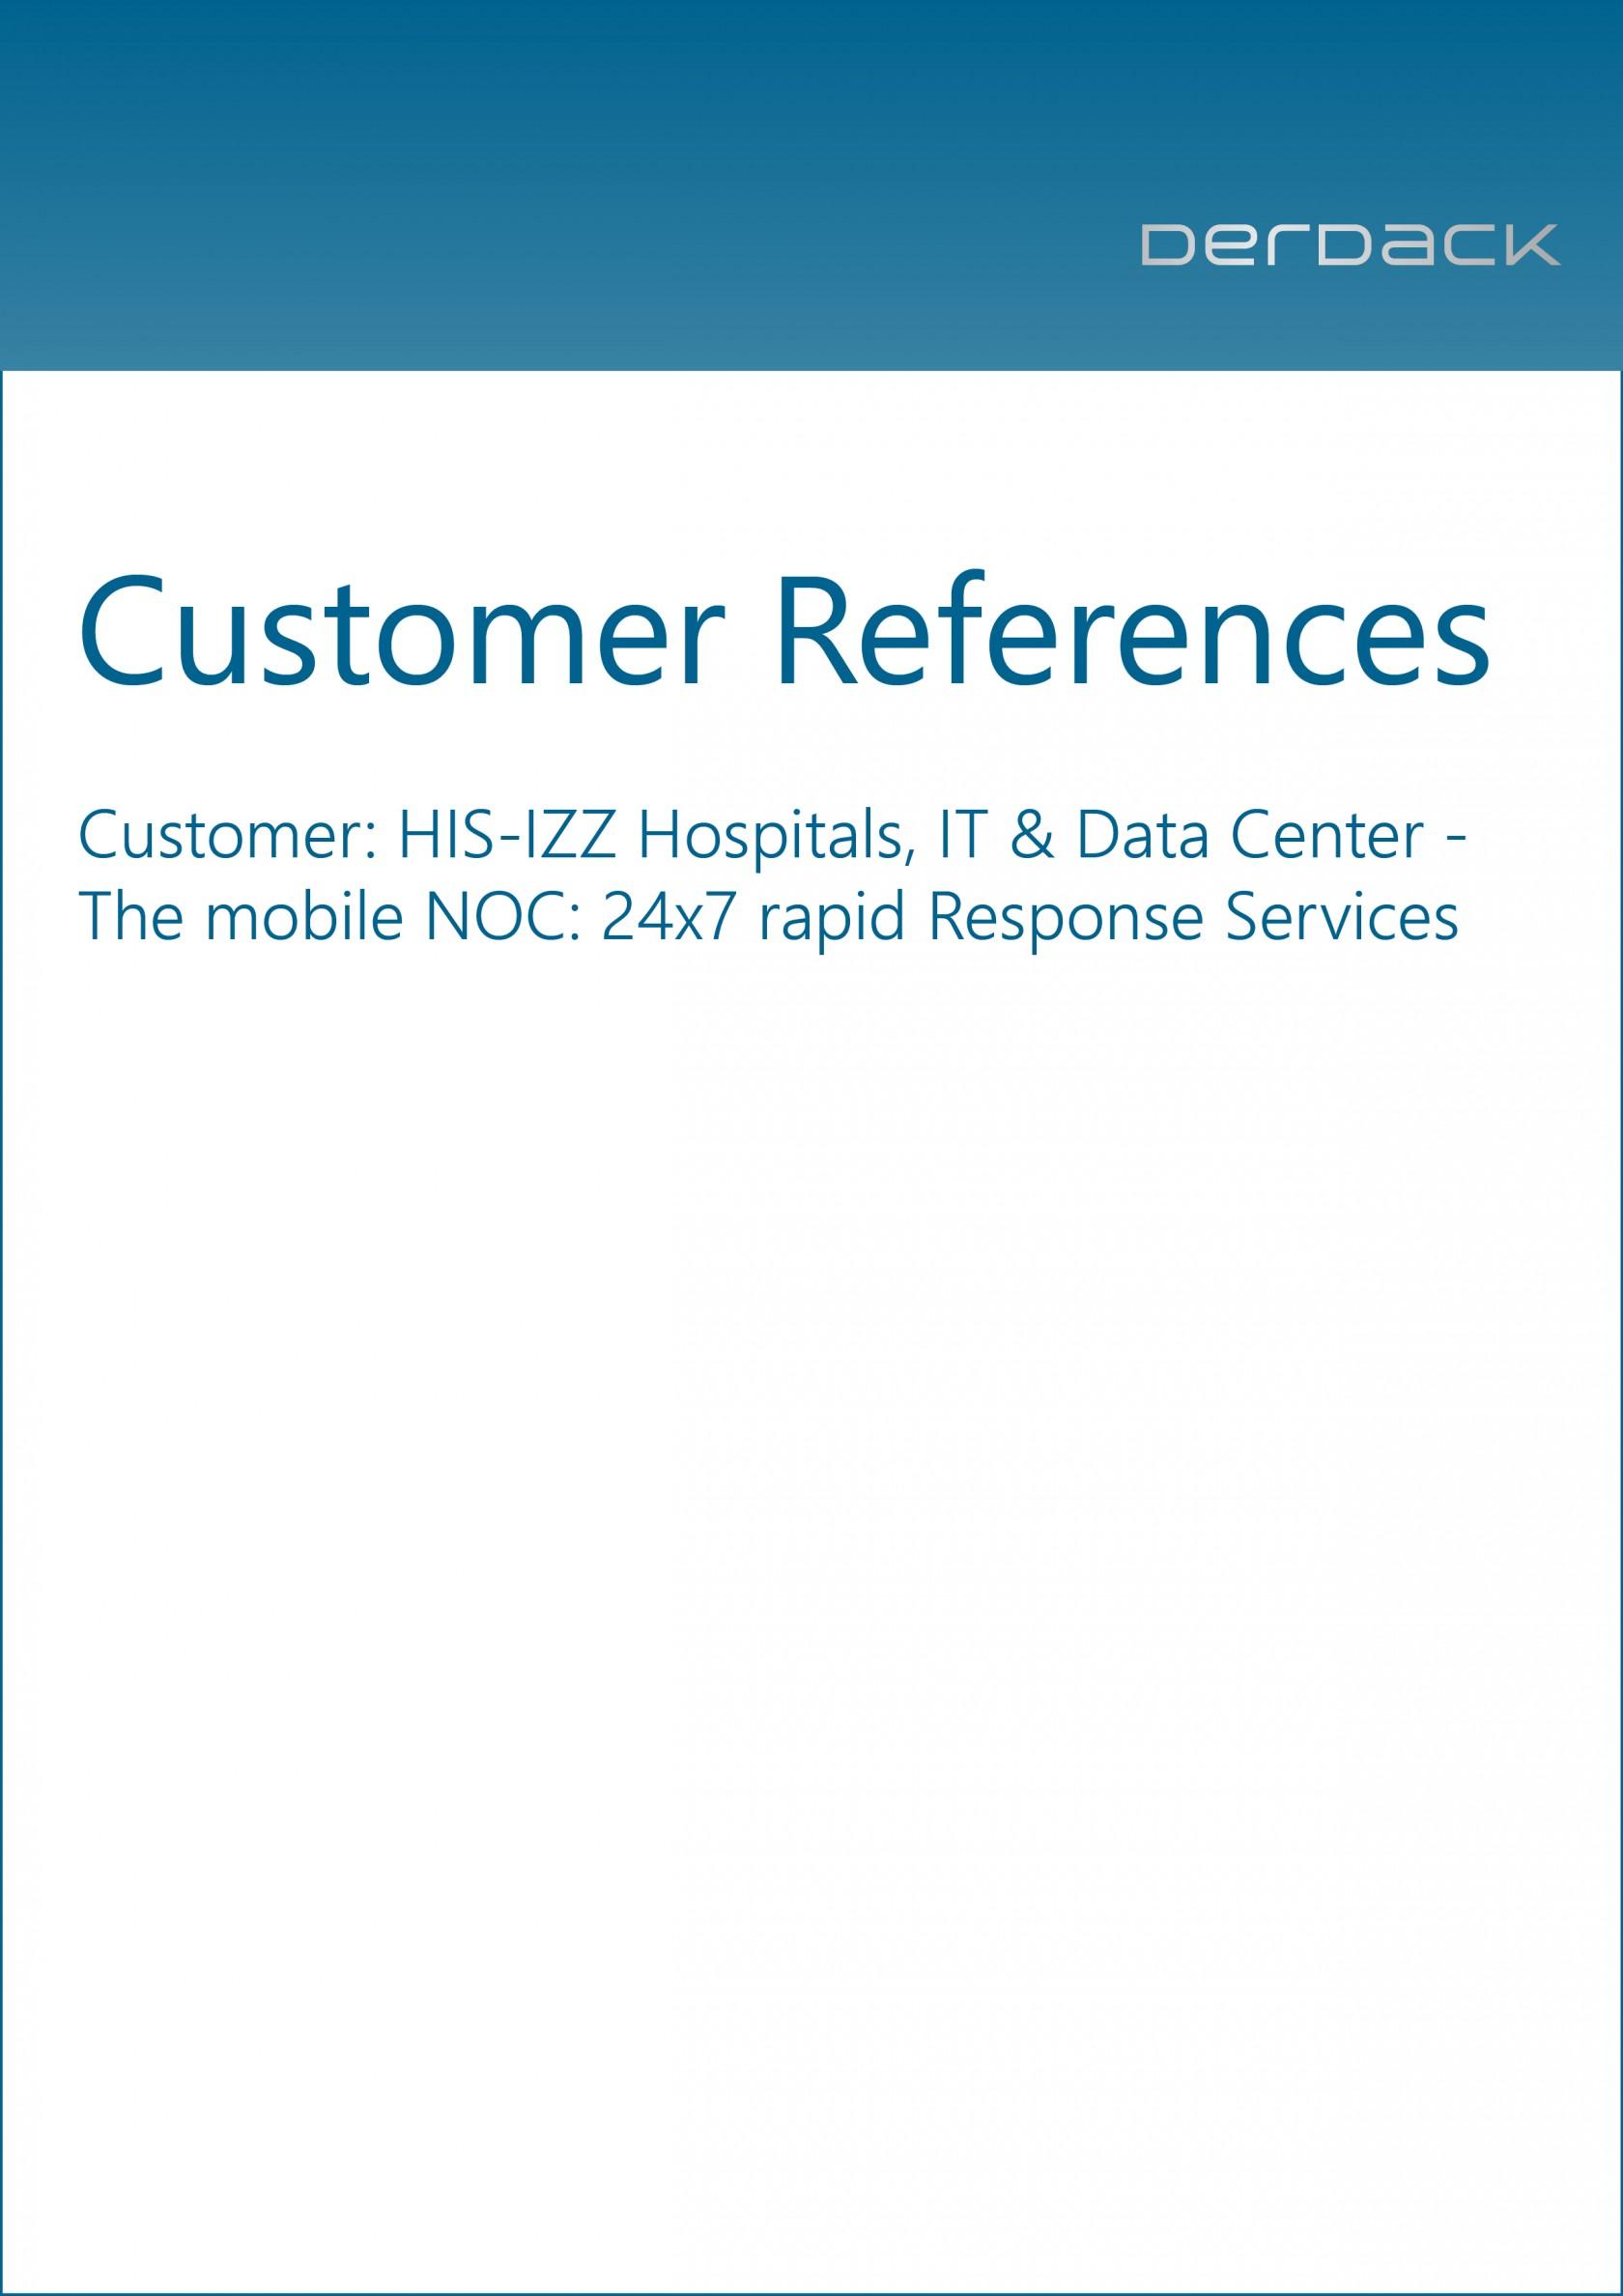 Derdack Customer References